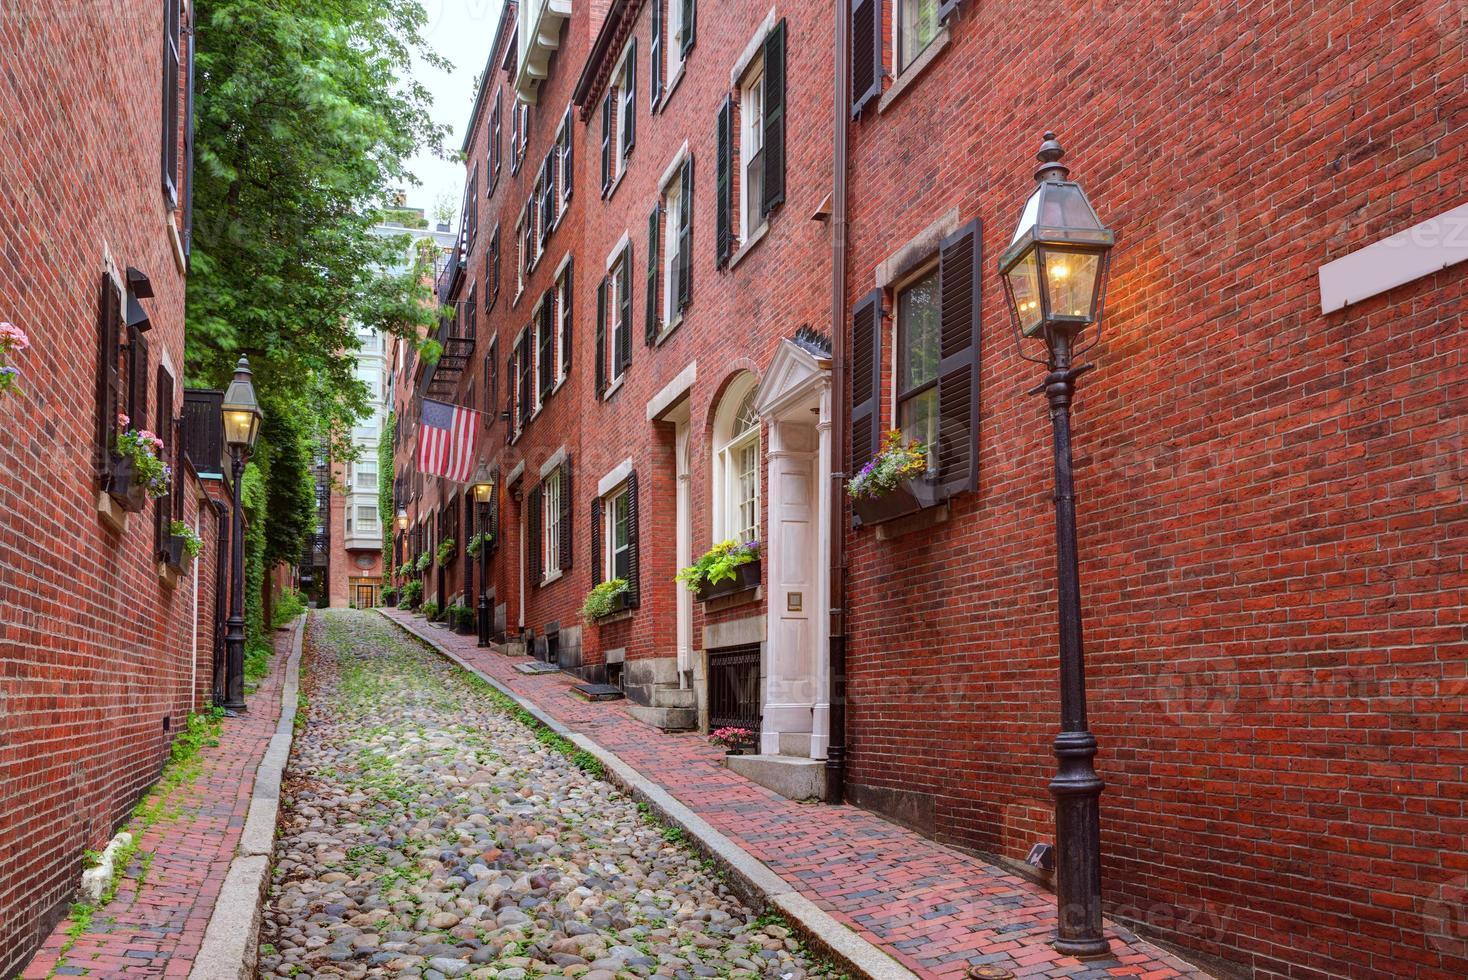 Bellota calle Beacon Hill adoquines Boston foto